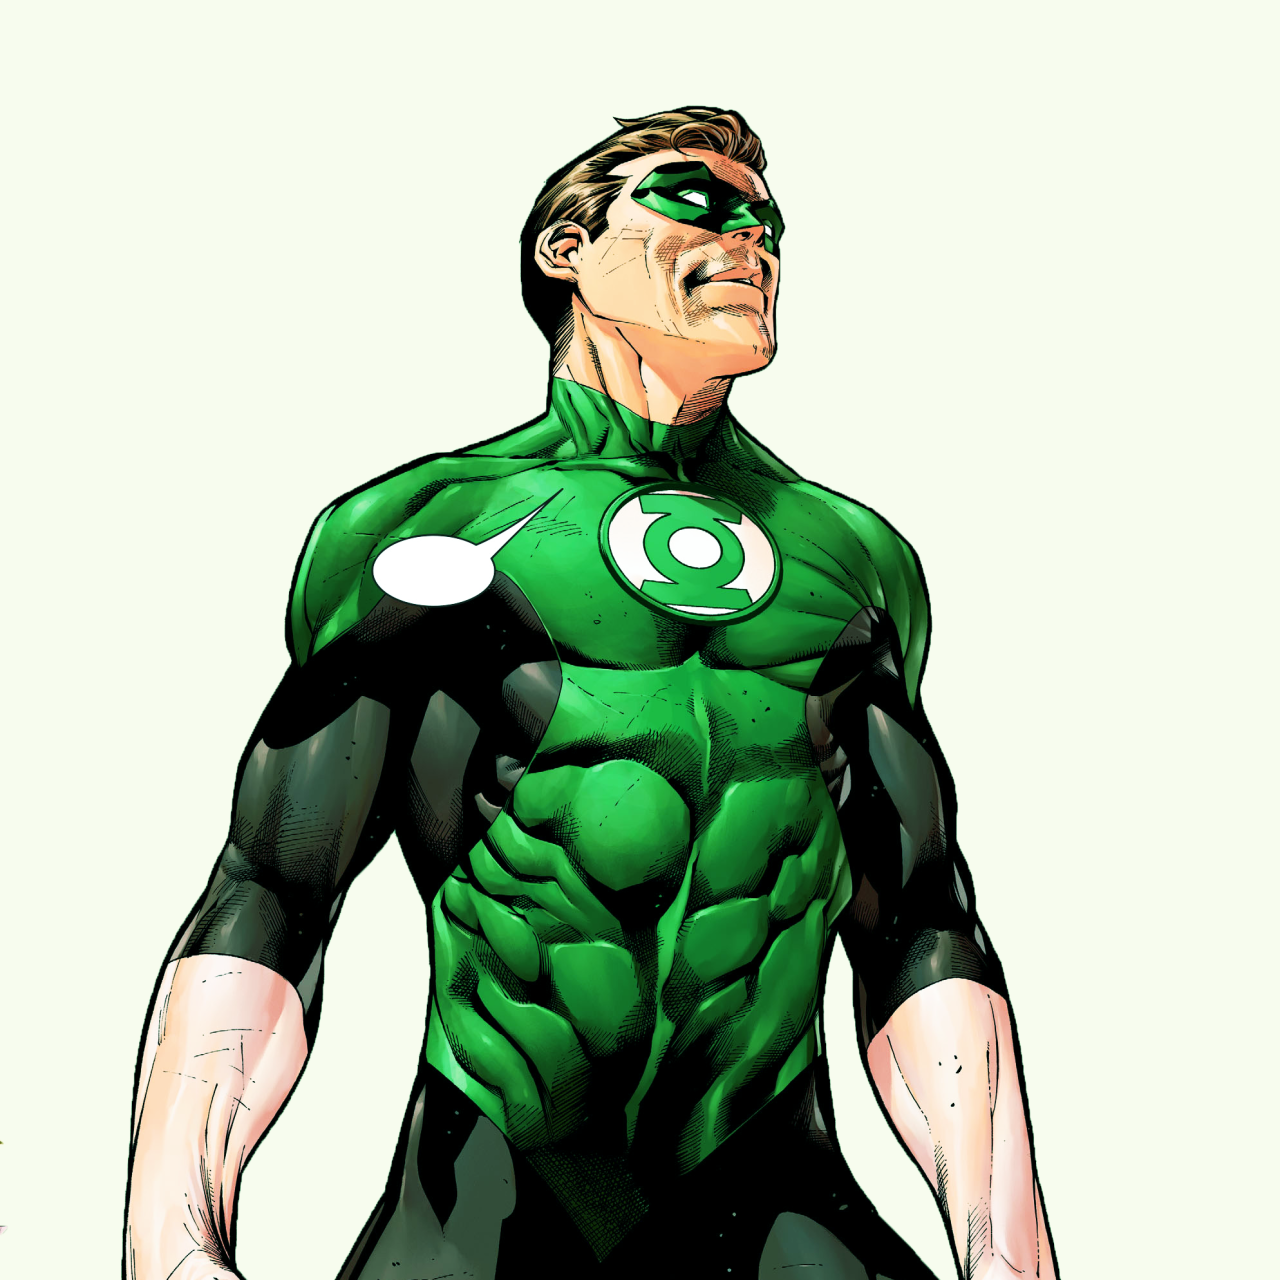 Hal In Hal Jordan And The Green Lantern Corps 2 Green Lantern Corps Green Lantern Hal Jordan Green Lantern